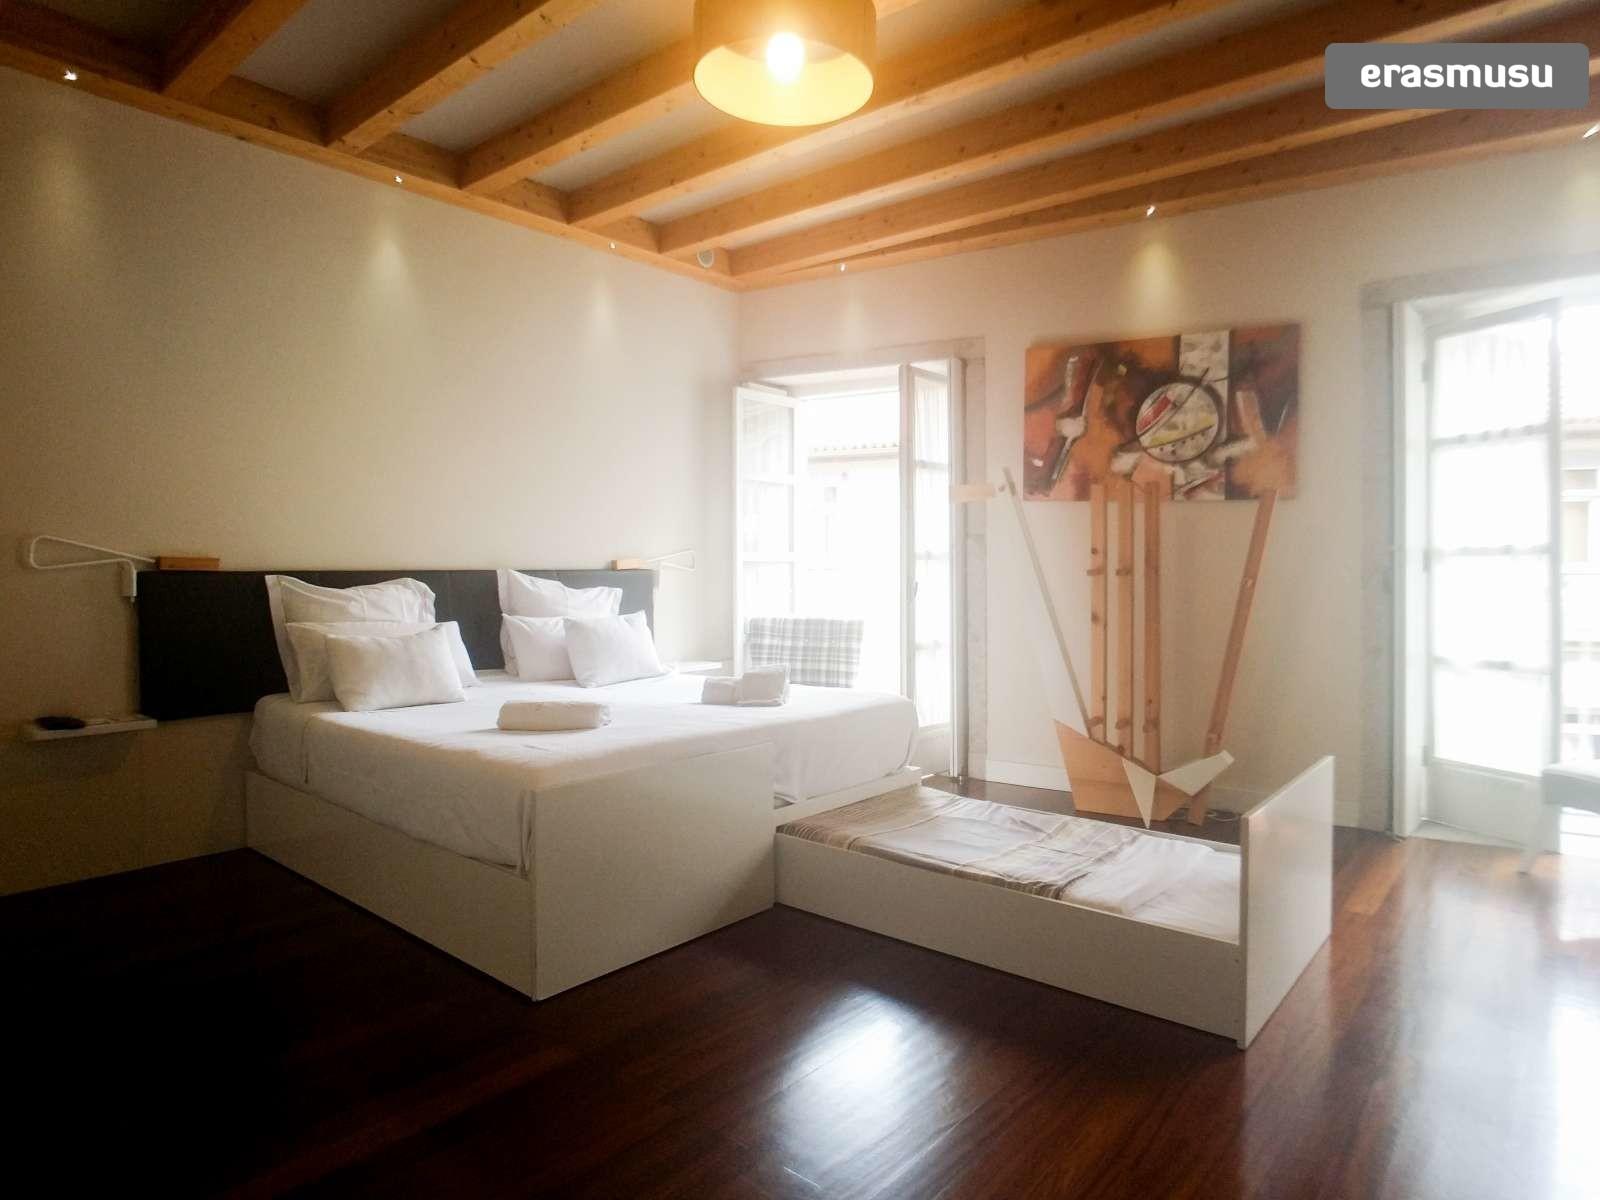 furnished-studio-apartment-rent-sao-nicolau-2a1306959a36343de324